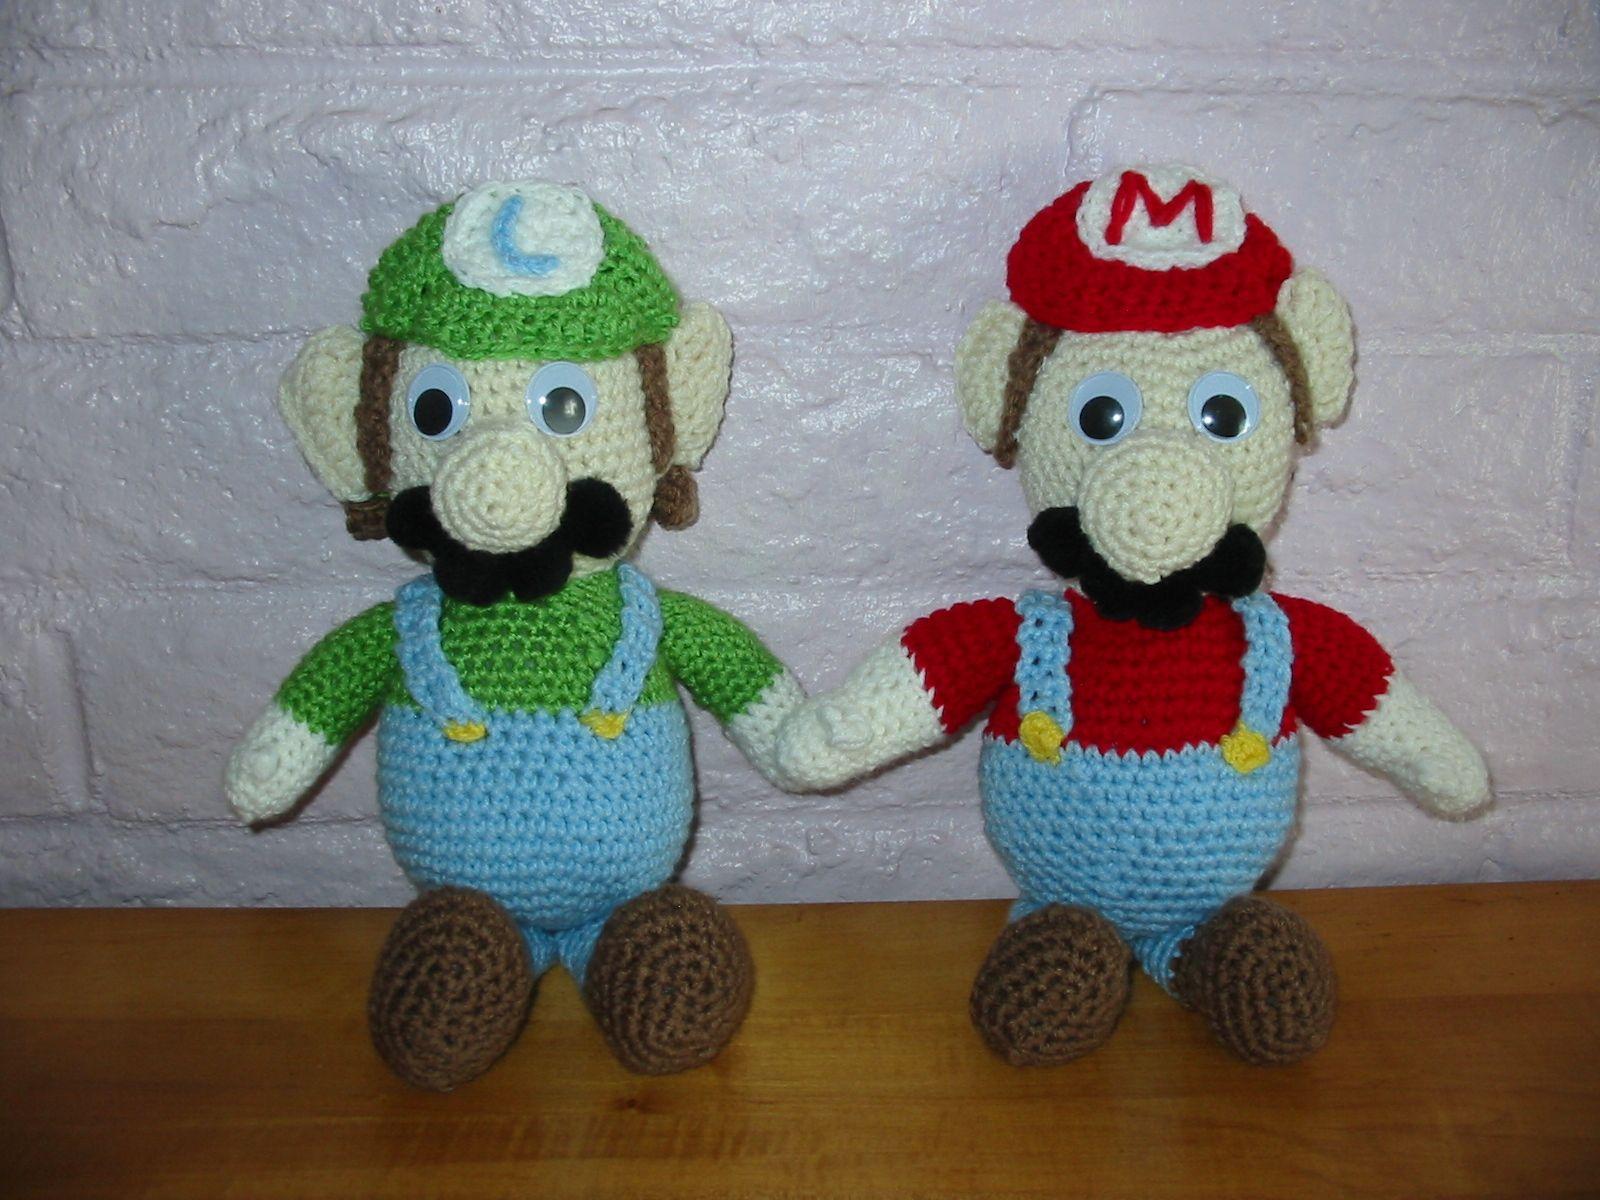 Luigi & Mario dolls I crocheted | Crochet Corner | Pinterest